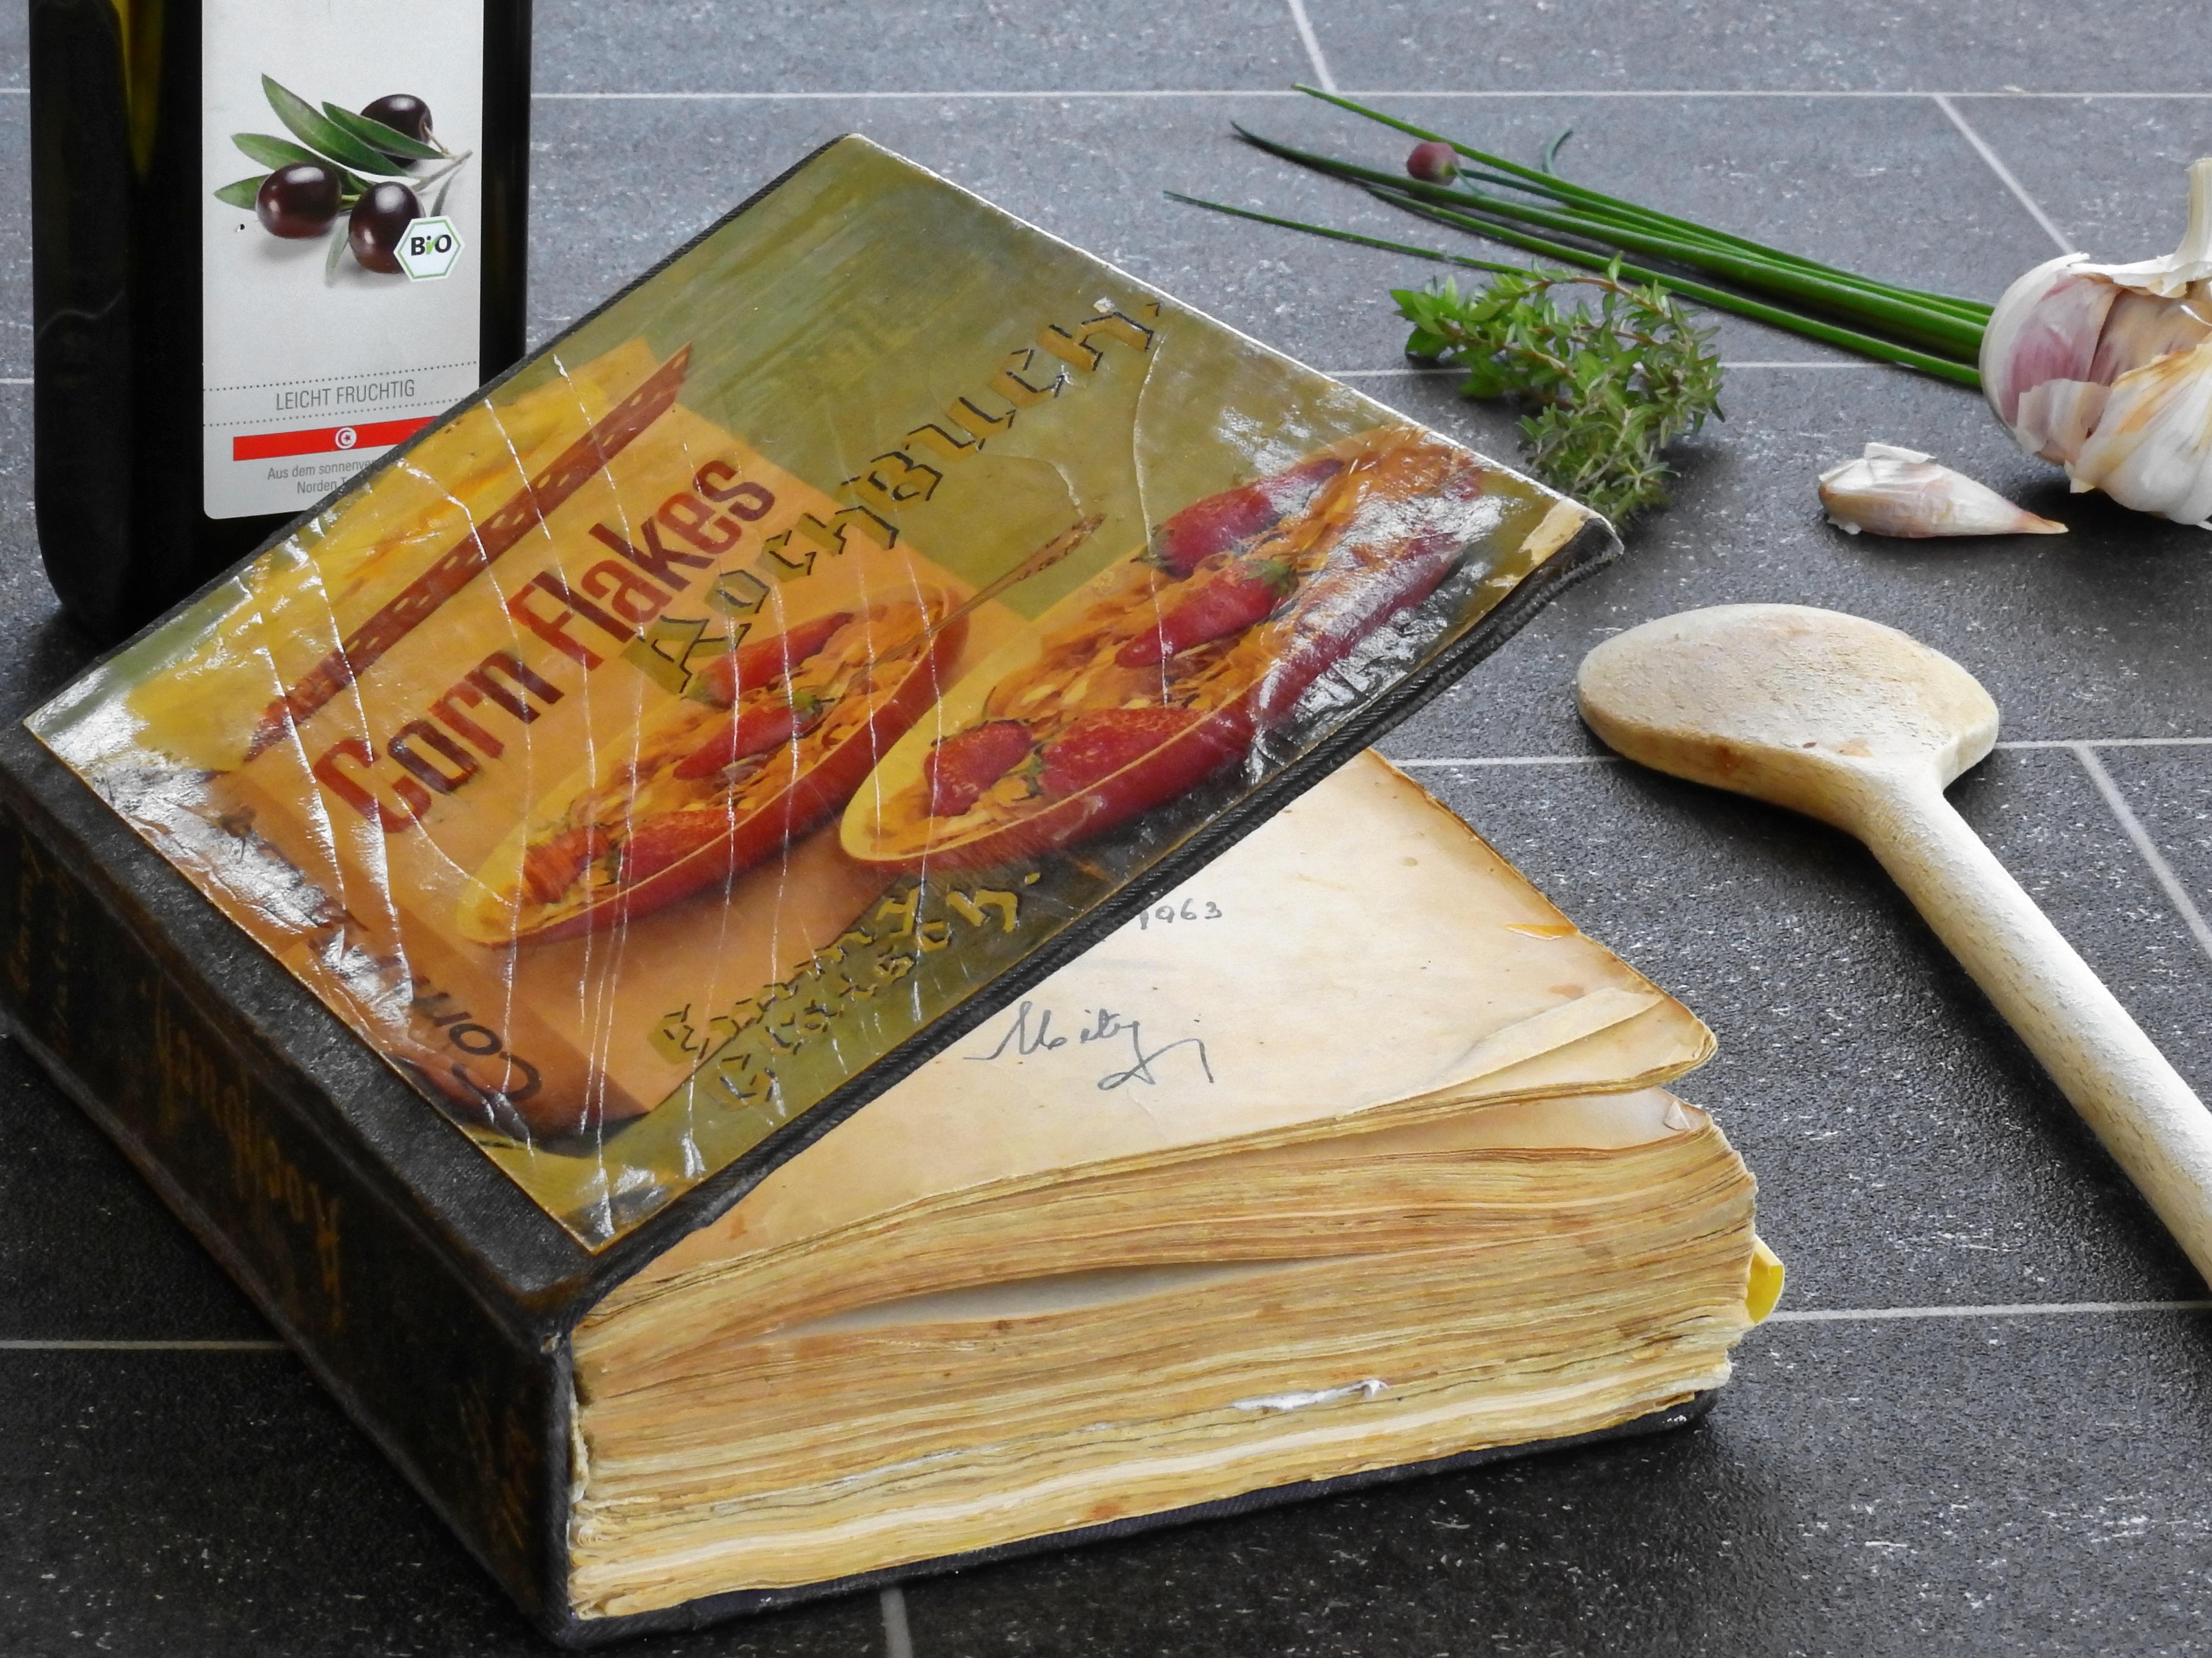 Fotos Gratis Antiguo Plato Comida Produce Horneando Comer